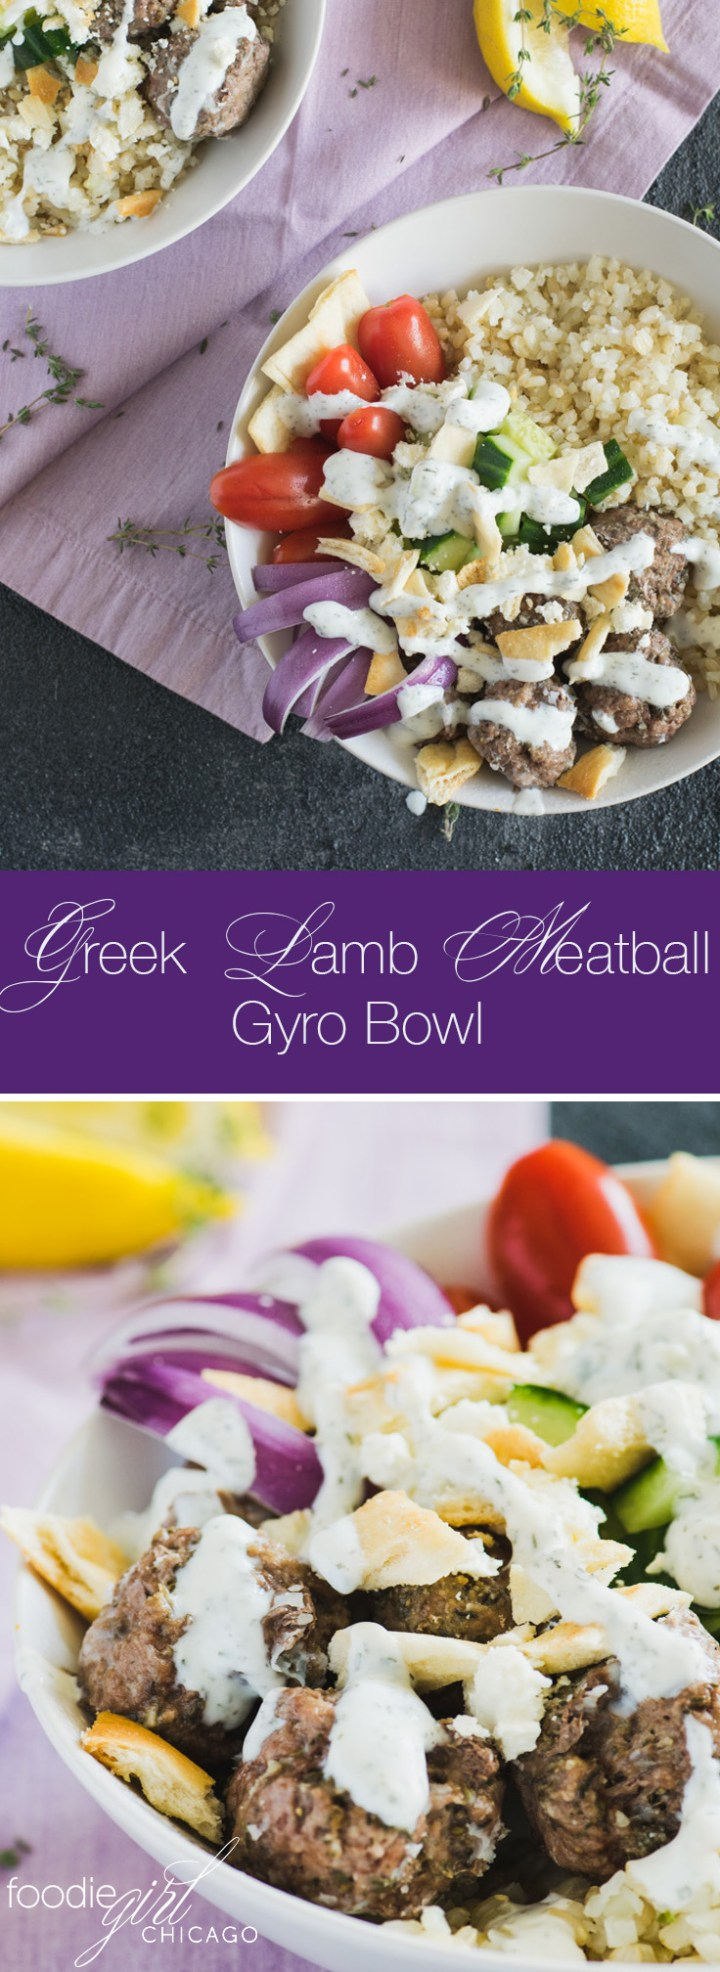 Greek Lamb Meatball Gyro Bowl